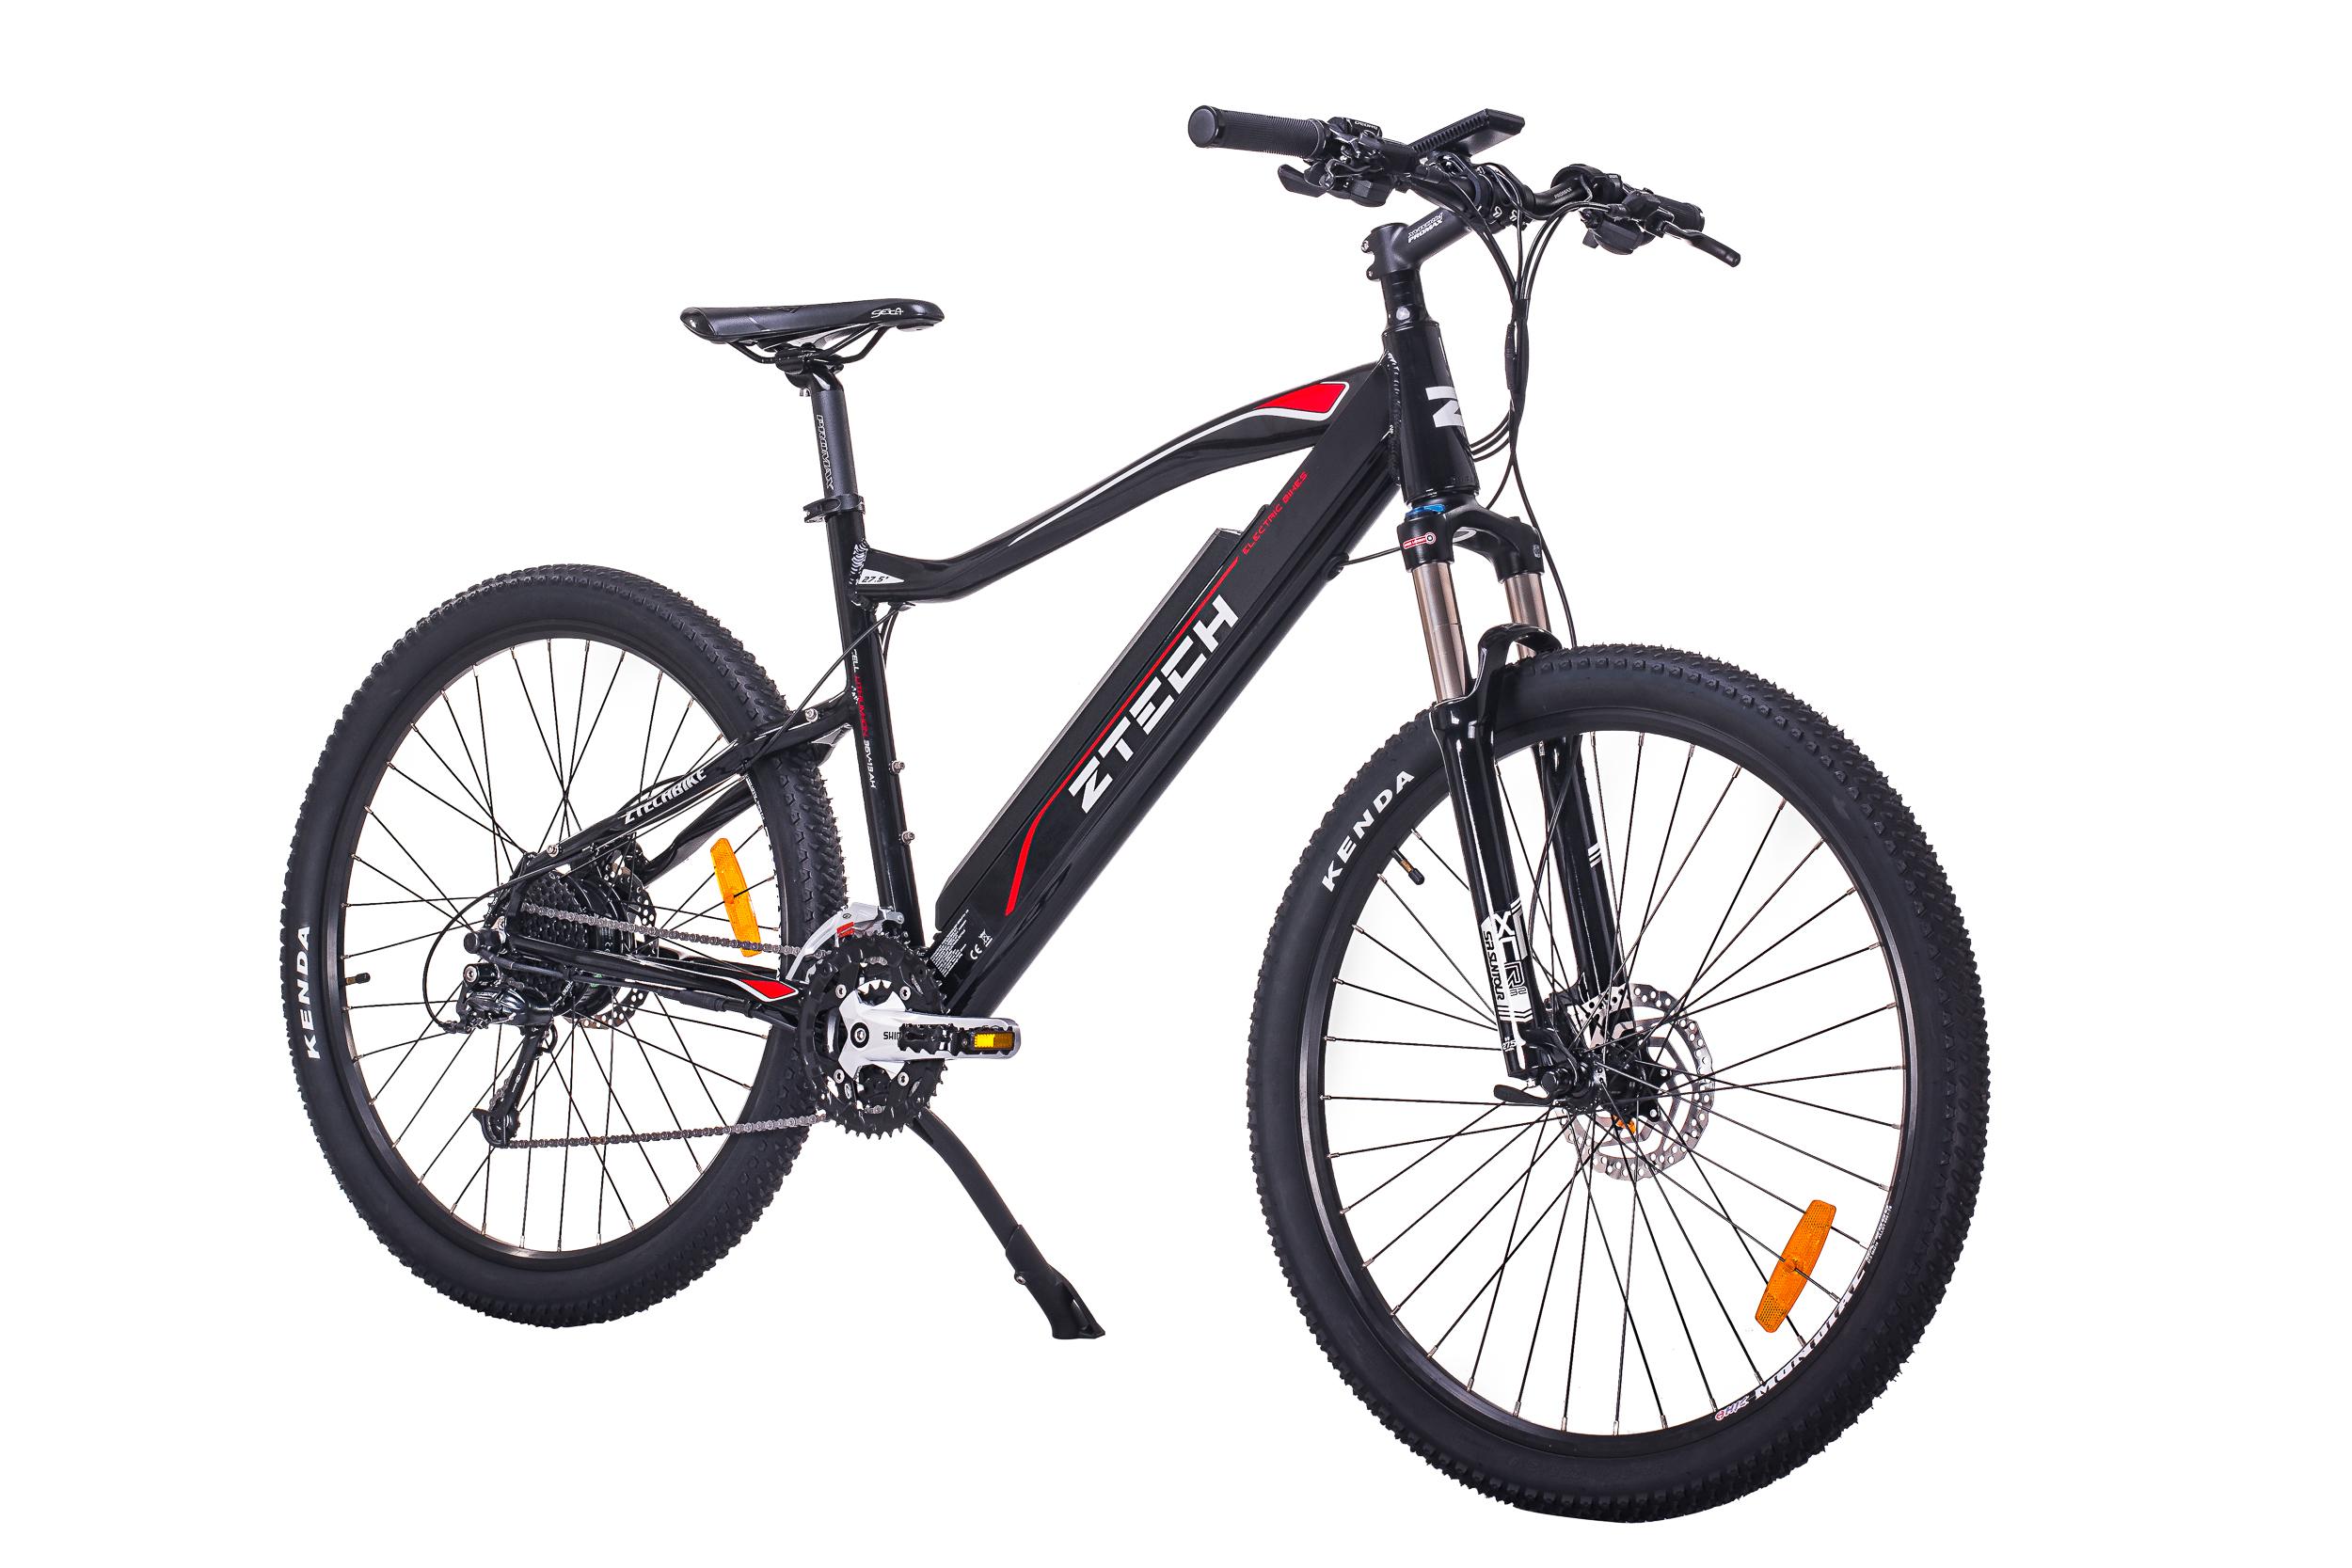 Bicicleta electrica MTB Ztech ZT-86 Sport